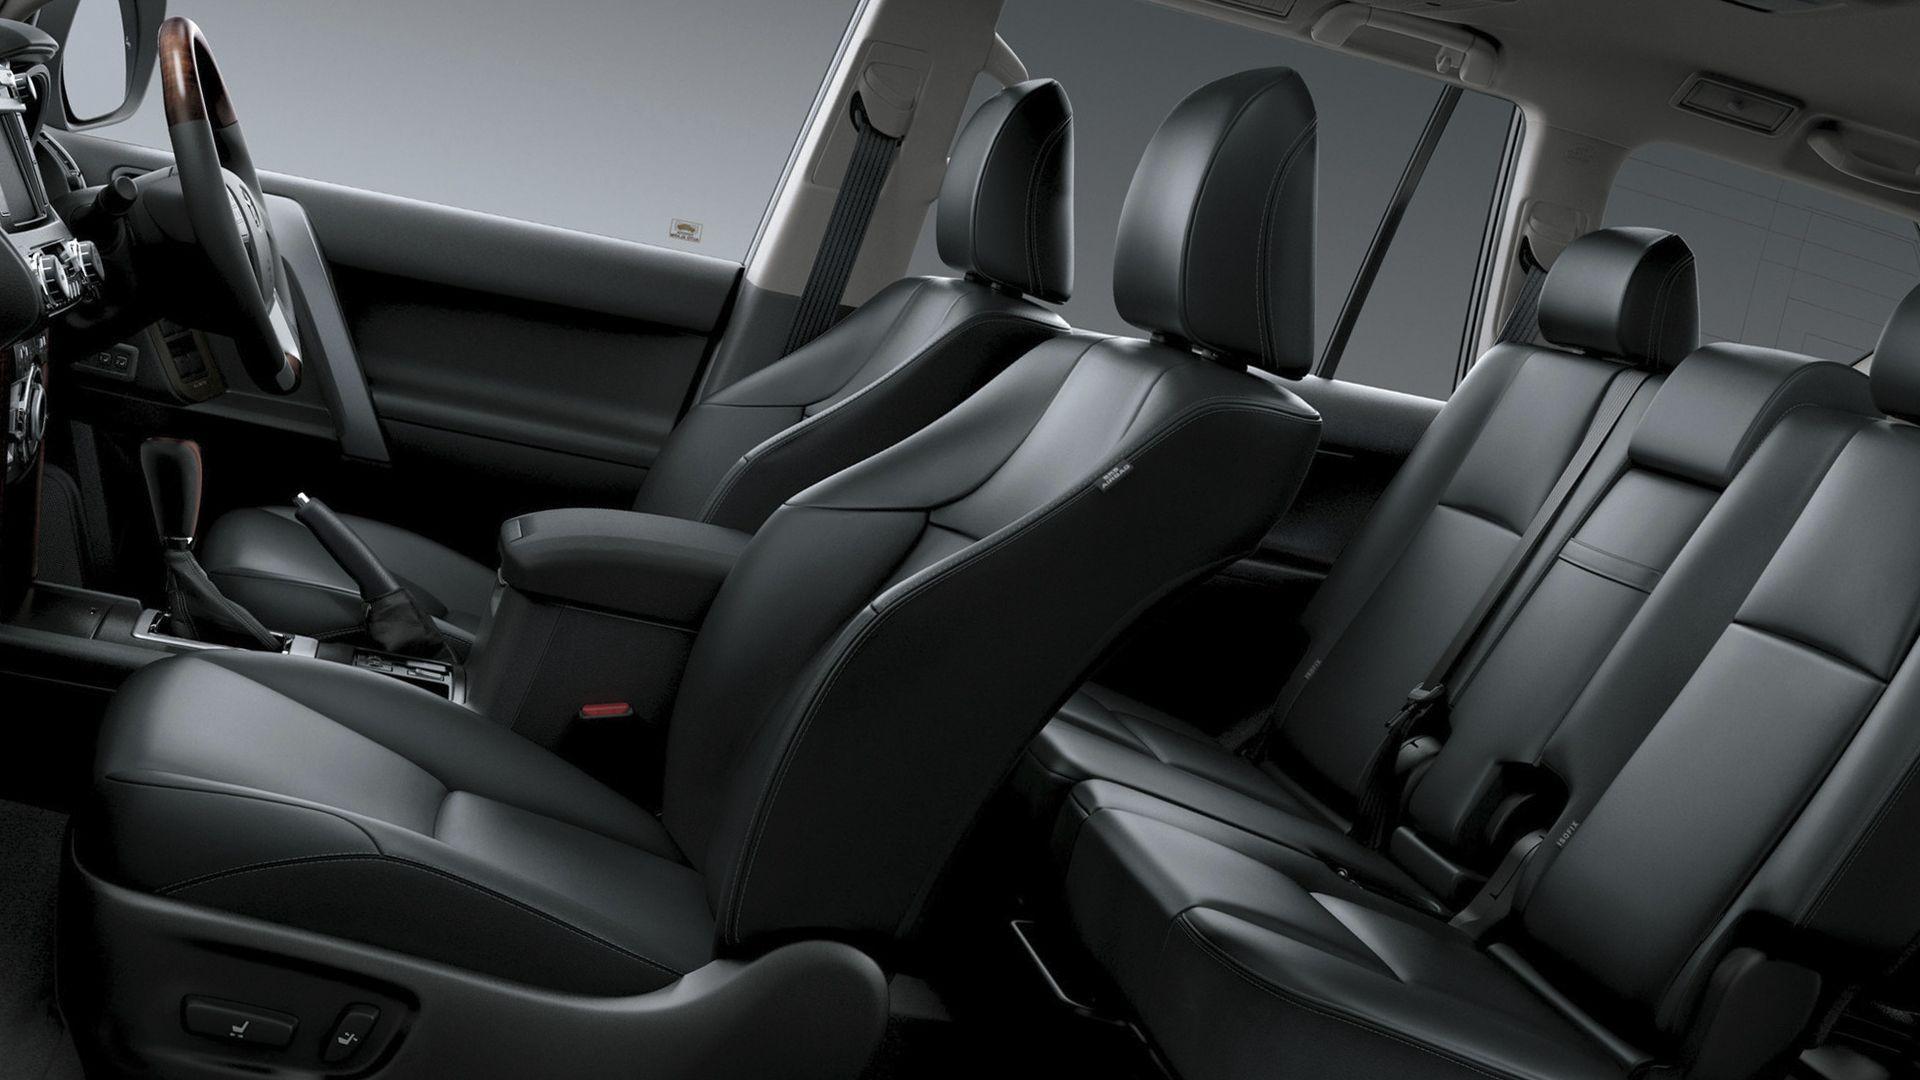 New 2019 Toyota Land Cruiser Prado Interior Design Toyota Land Cruiser Prado Land Cruiser Toyota Land Cruiser